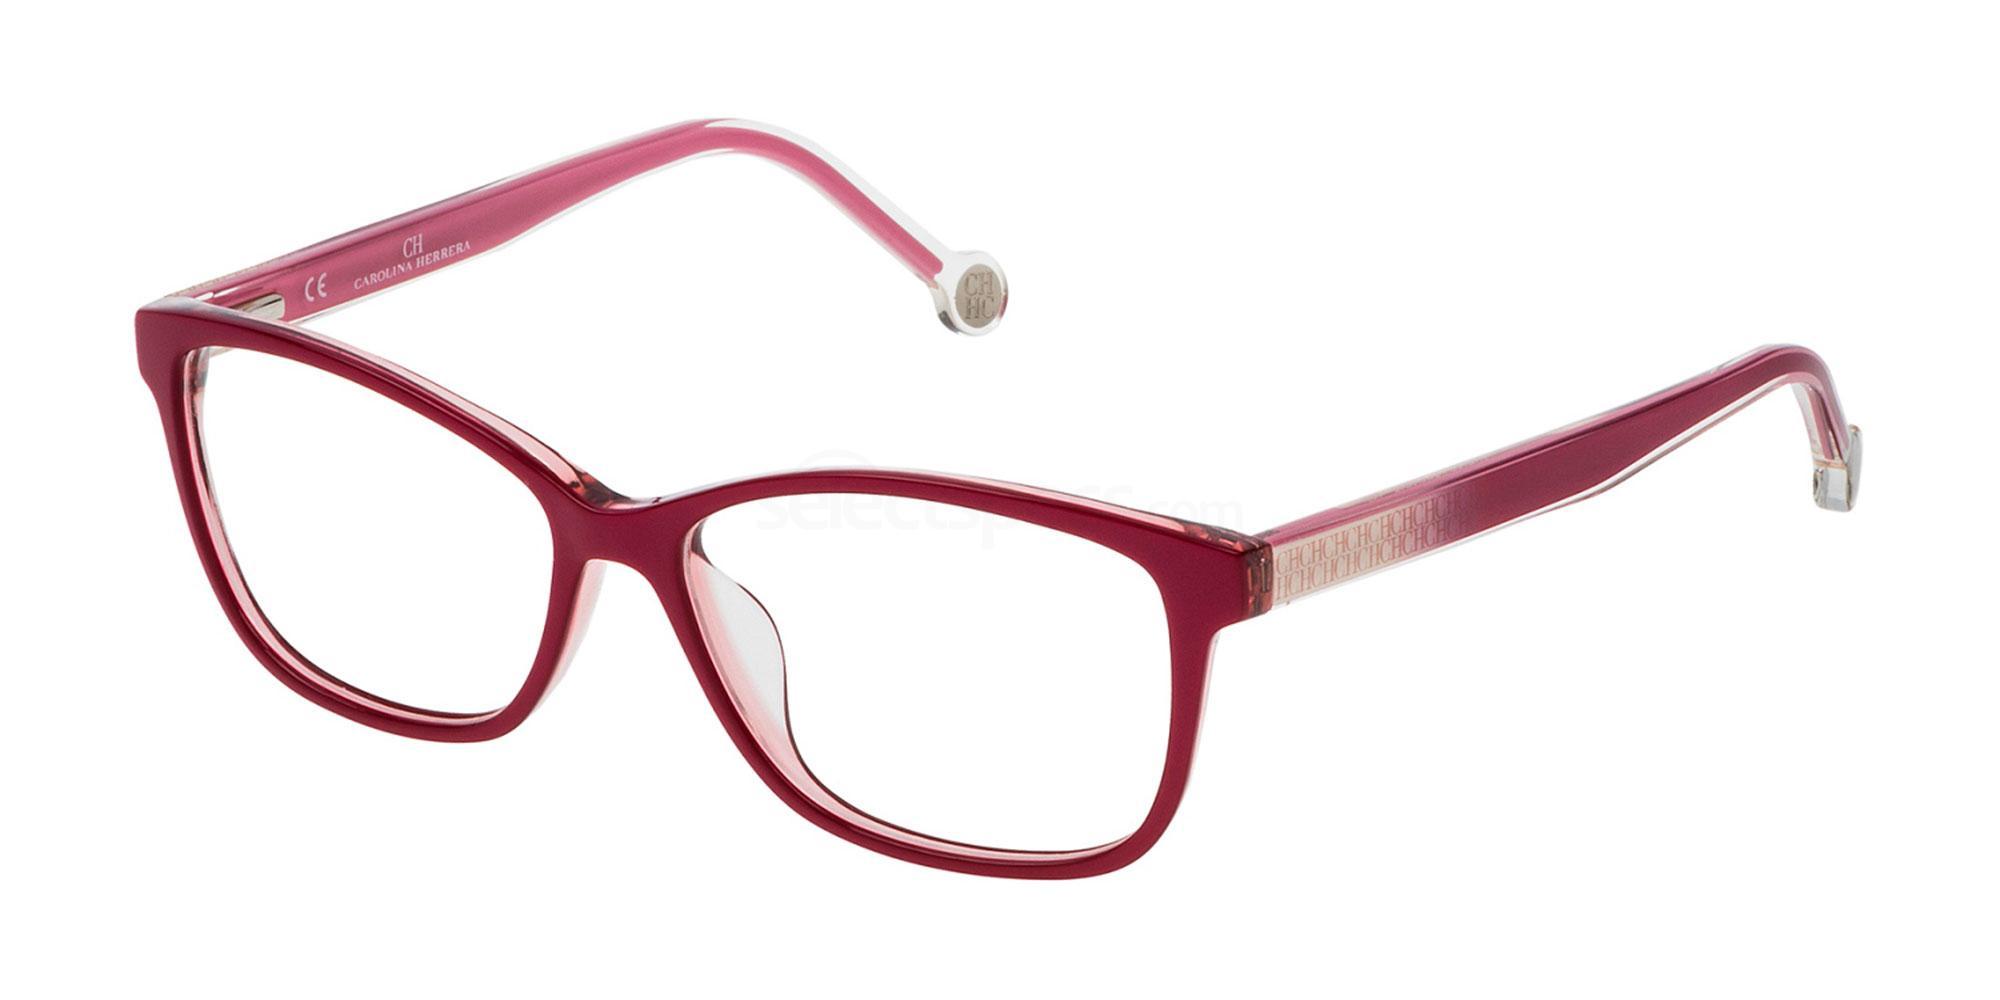 0B42 VHE723 Glasses, CH Carolina Herrera